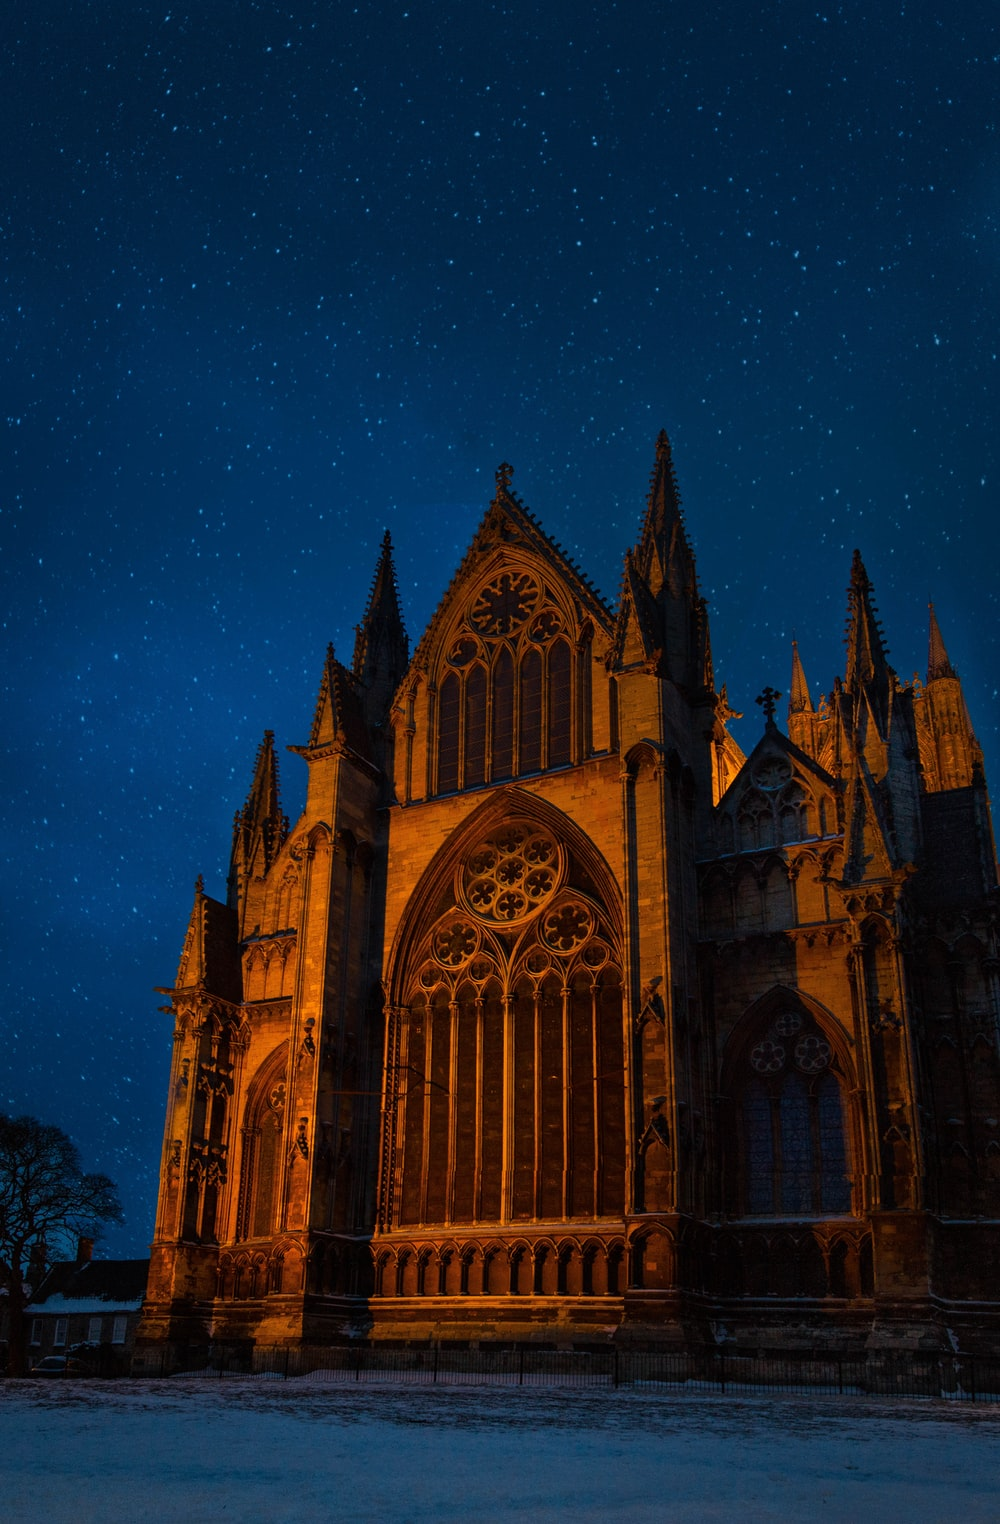 brown concrete church at nighttime